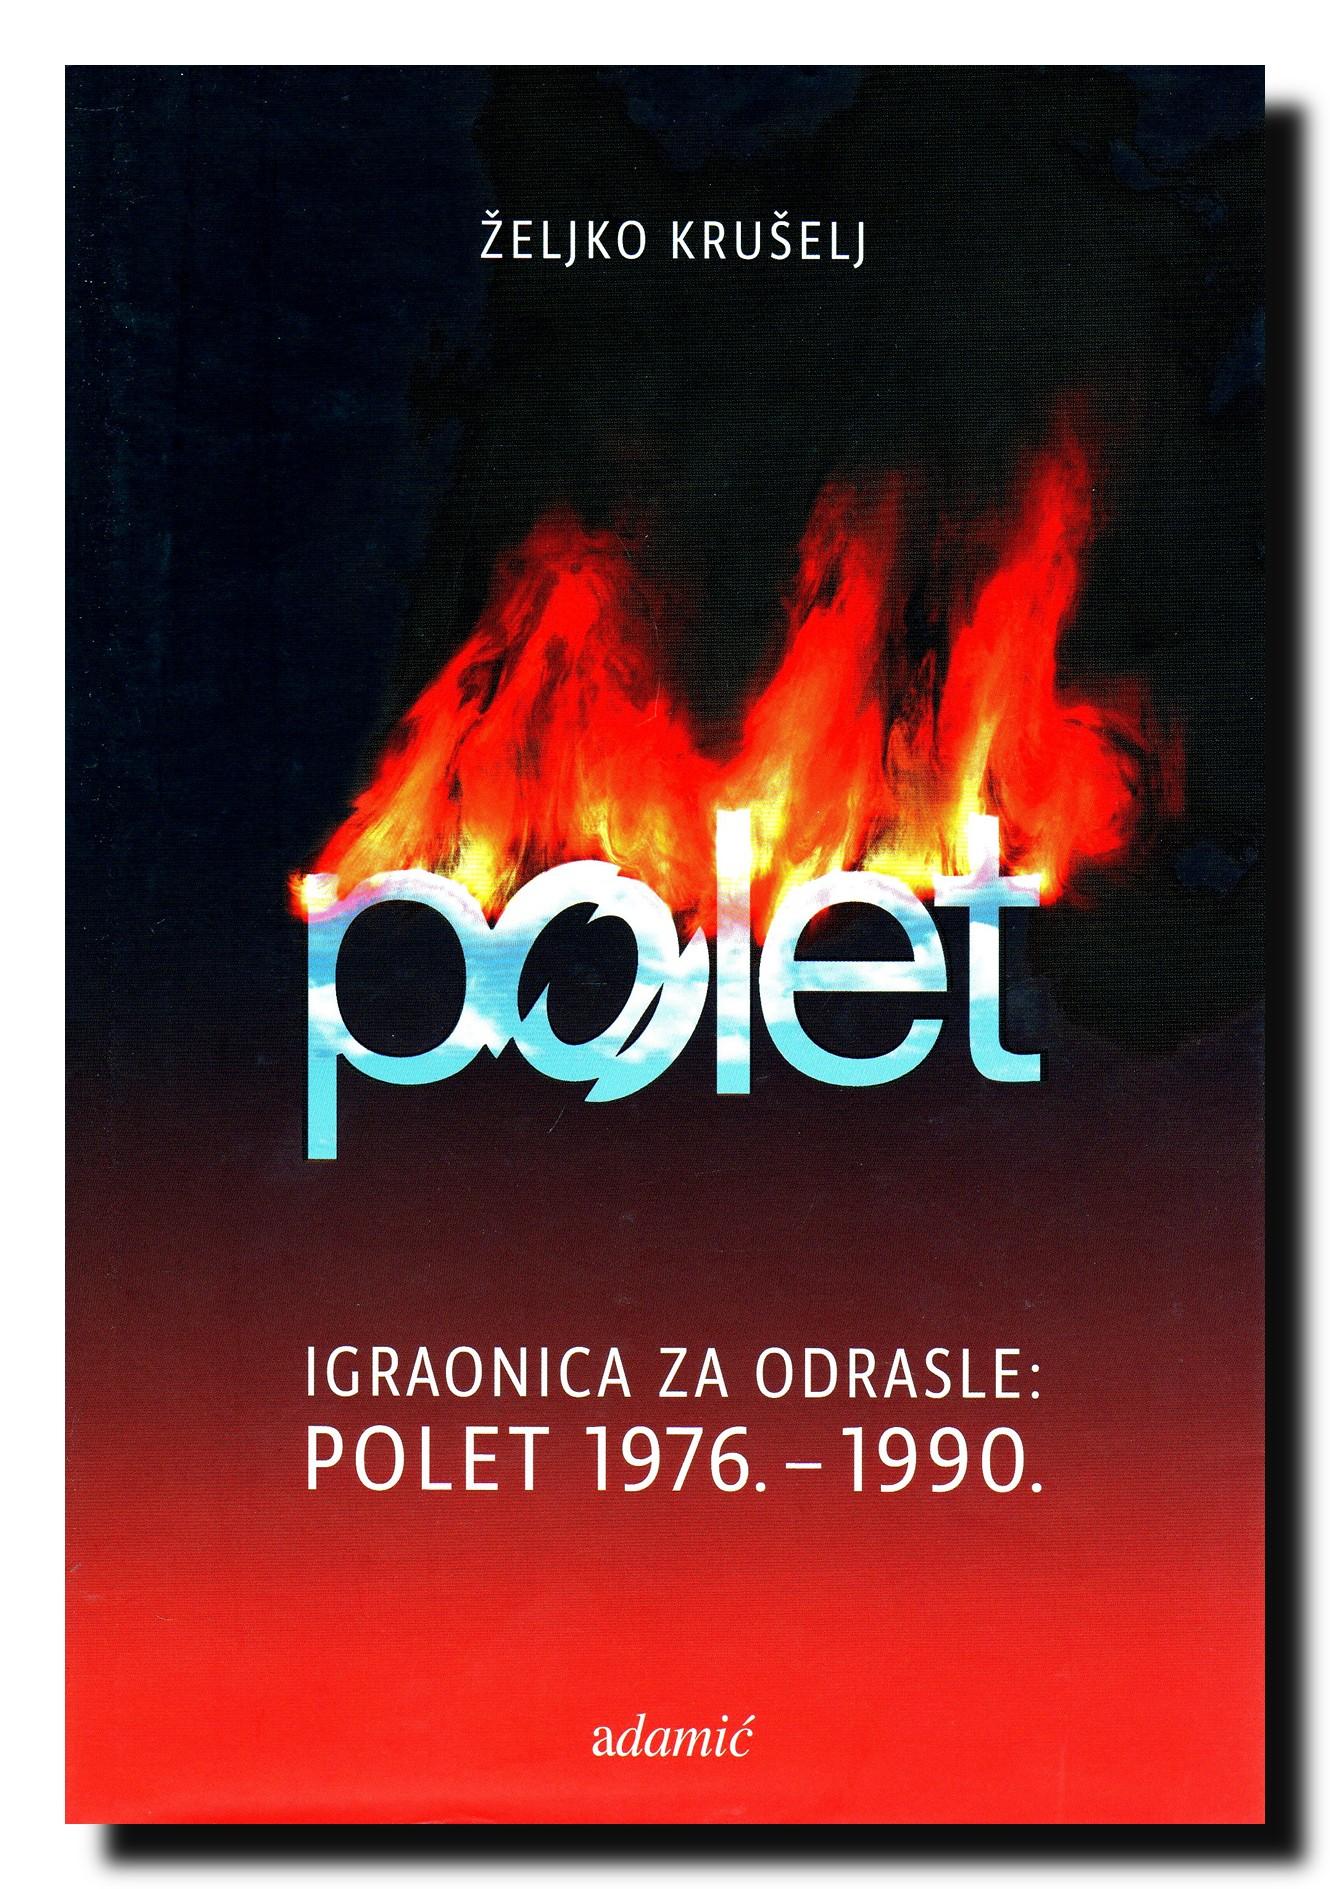 Igraonica za odrasle : Polet 1976. - 1990.